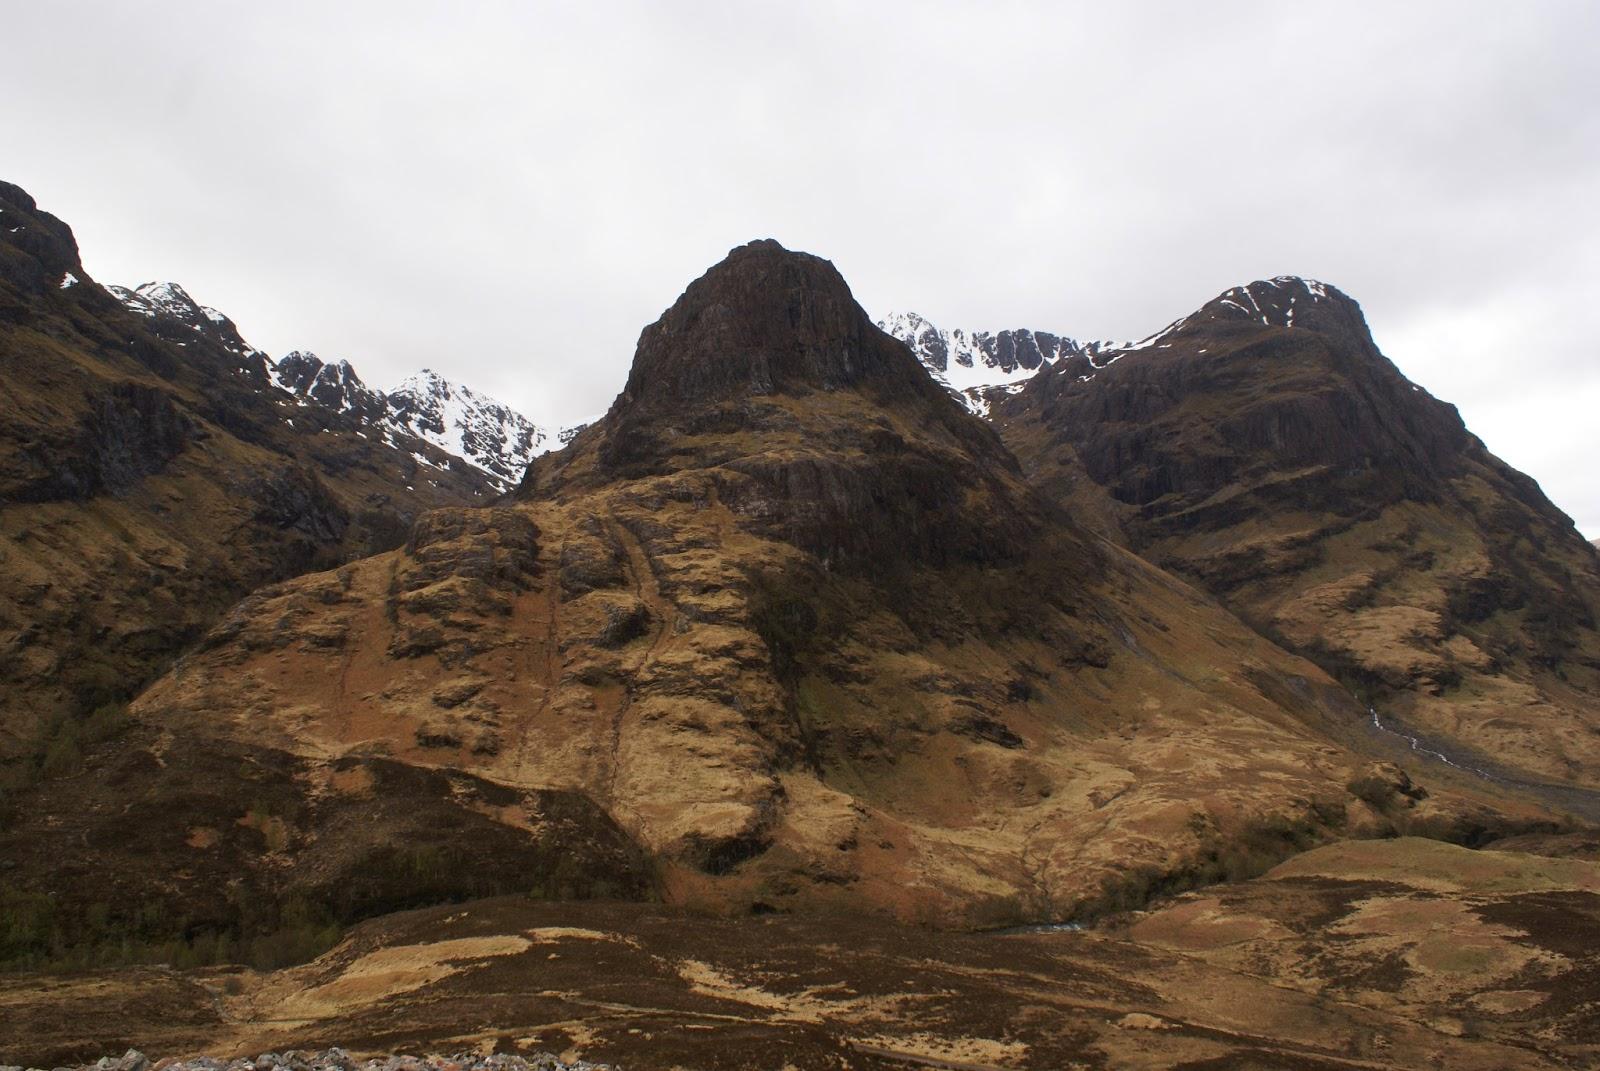 glen coe three sisters highlands scotland united kingdom uk